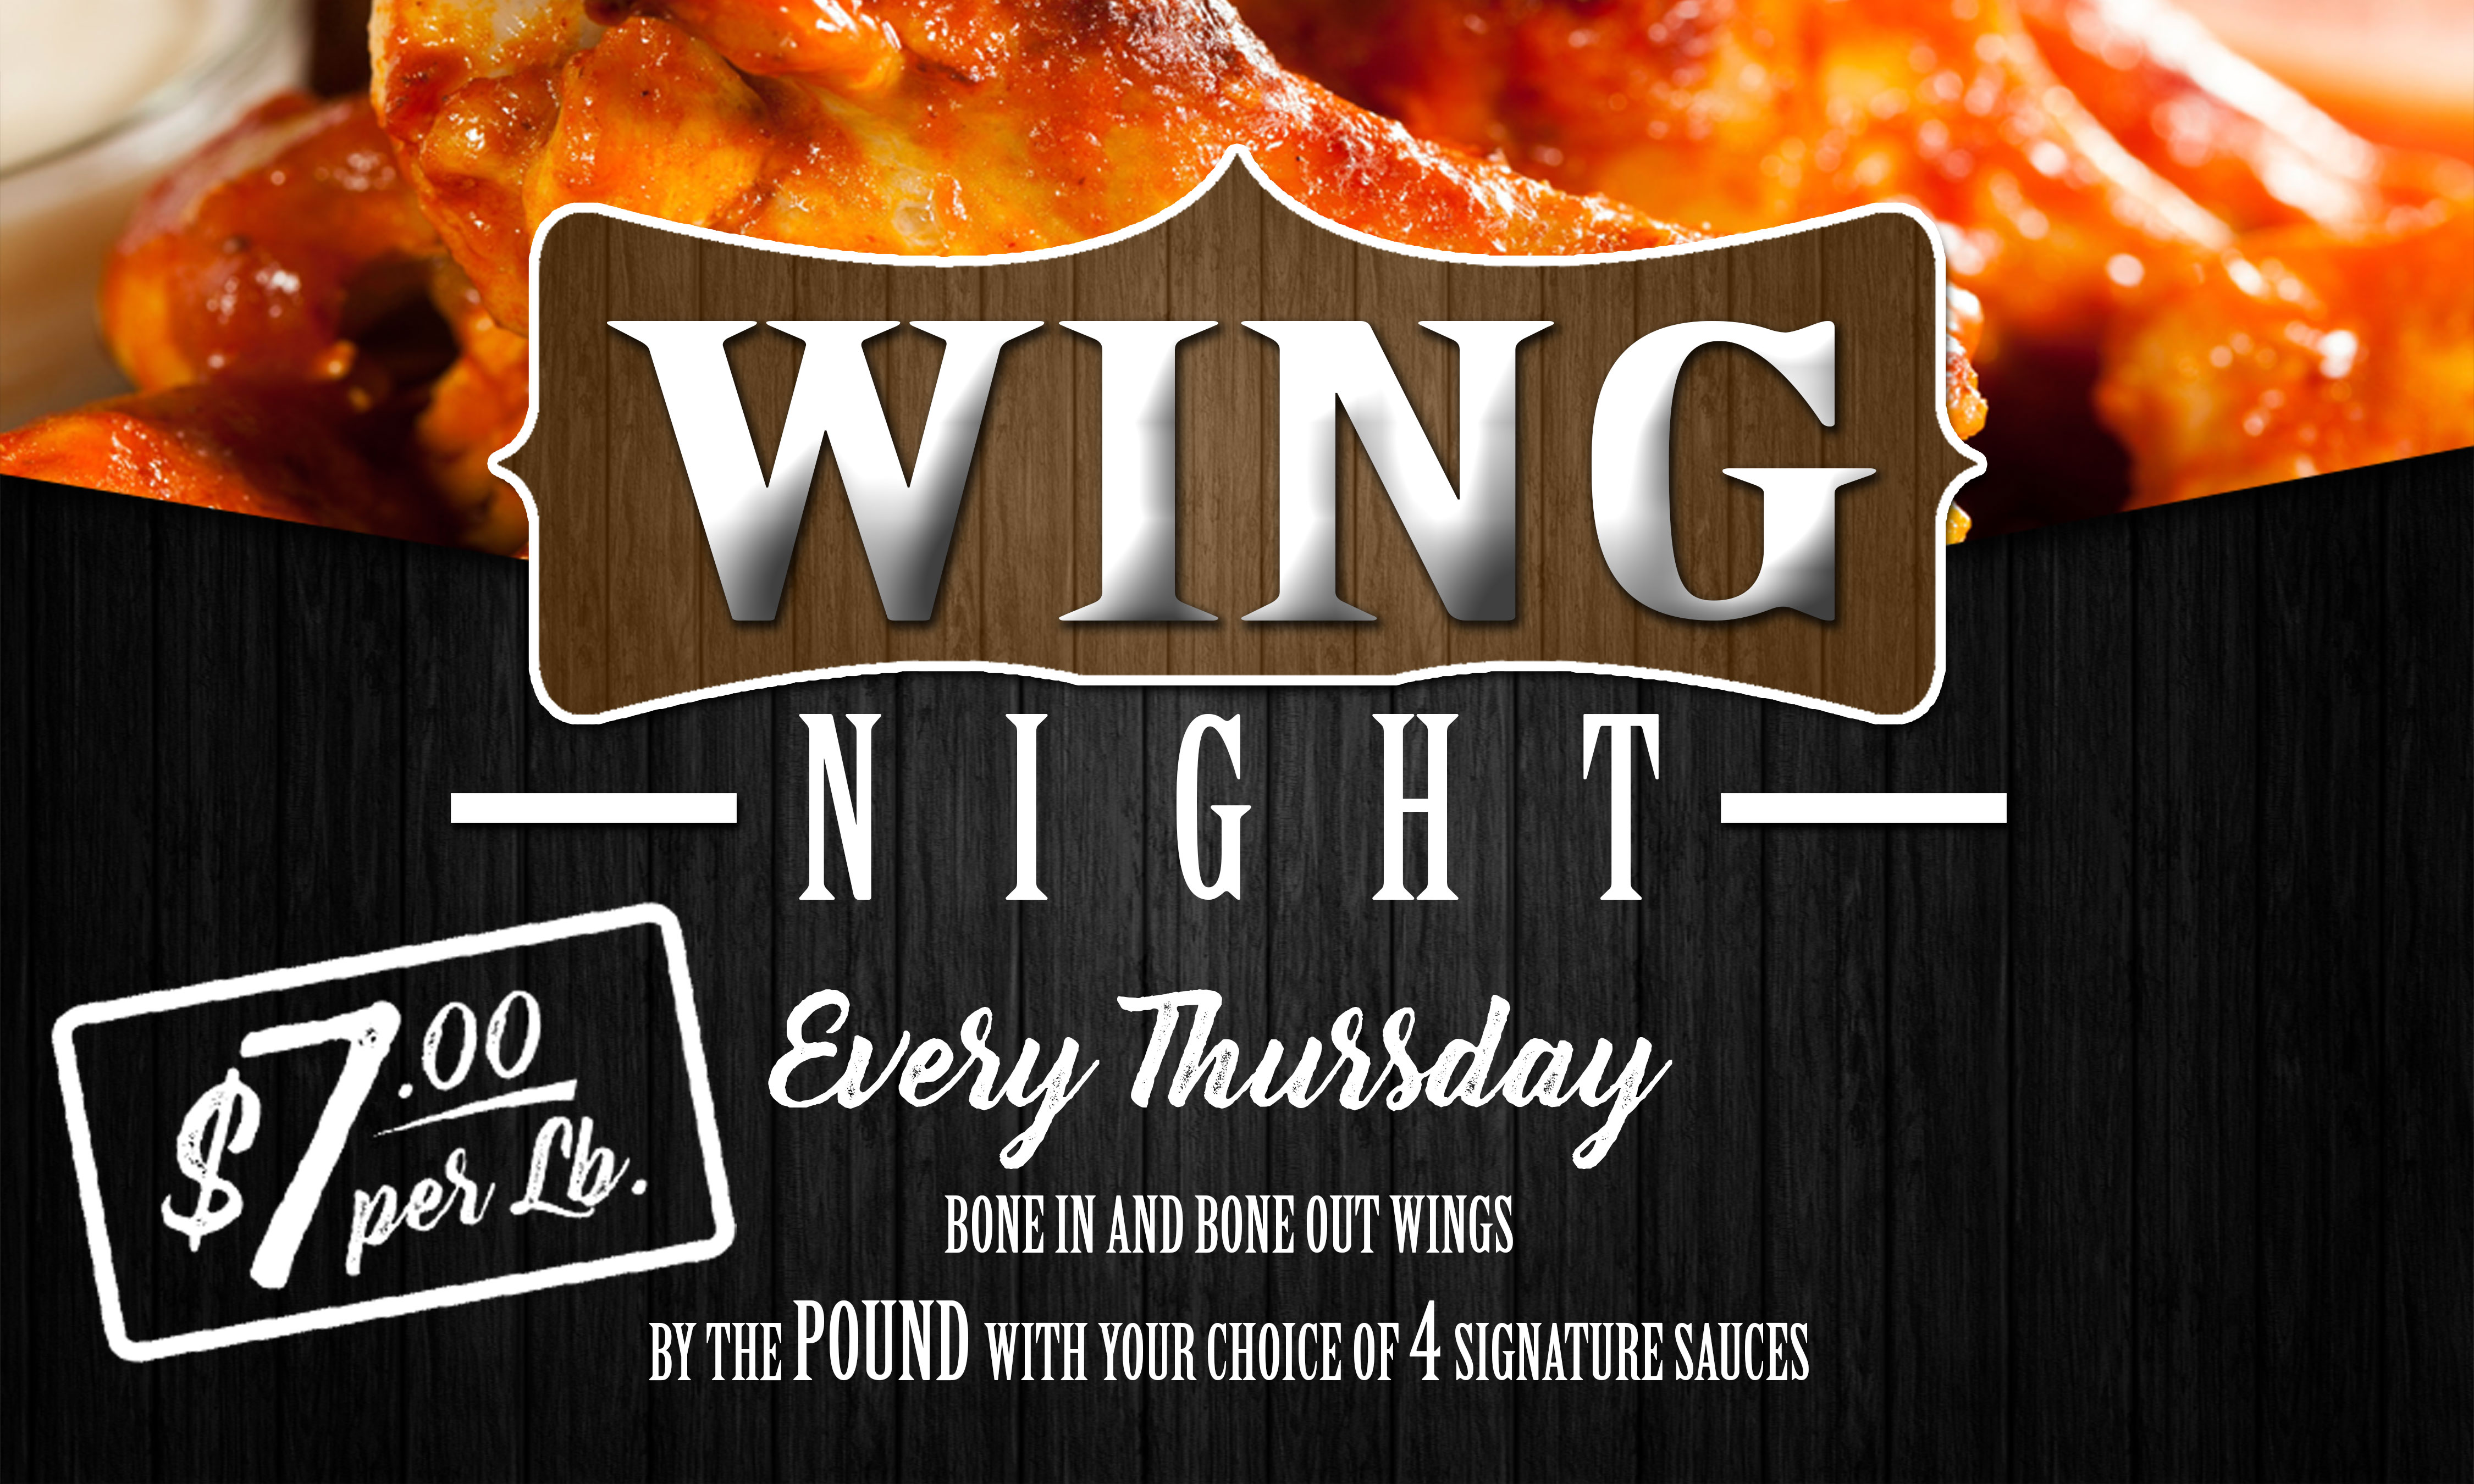 Monday night wing deals toronto